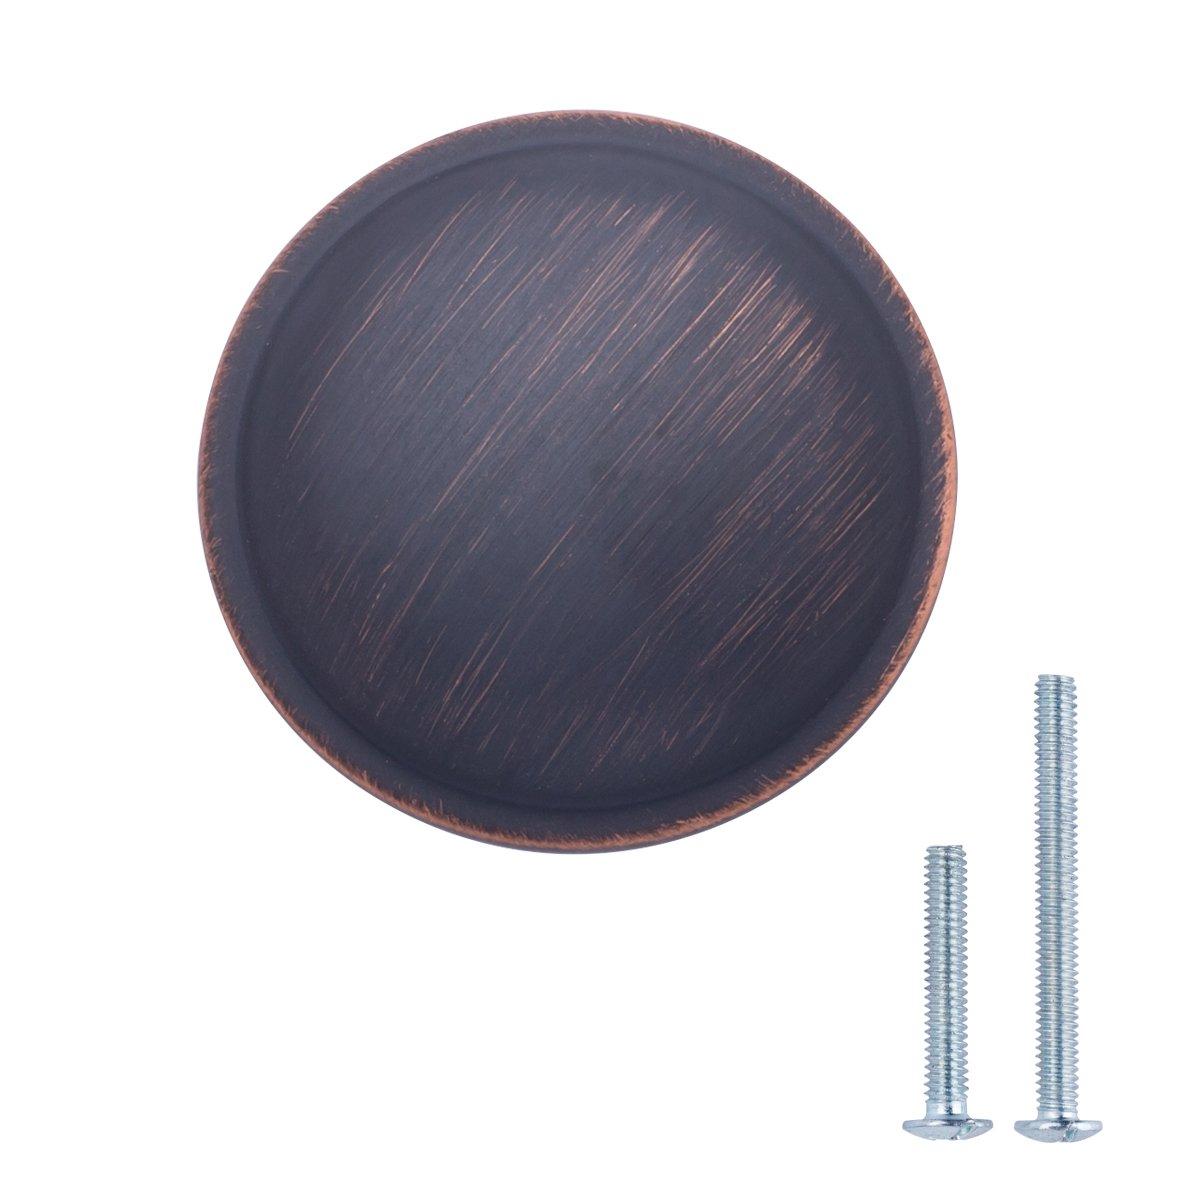 AmazonBasics Mushroom Cabinet Knob, 1.19'' Diameter, Oil Rubbed Bronze, 25-Pack